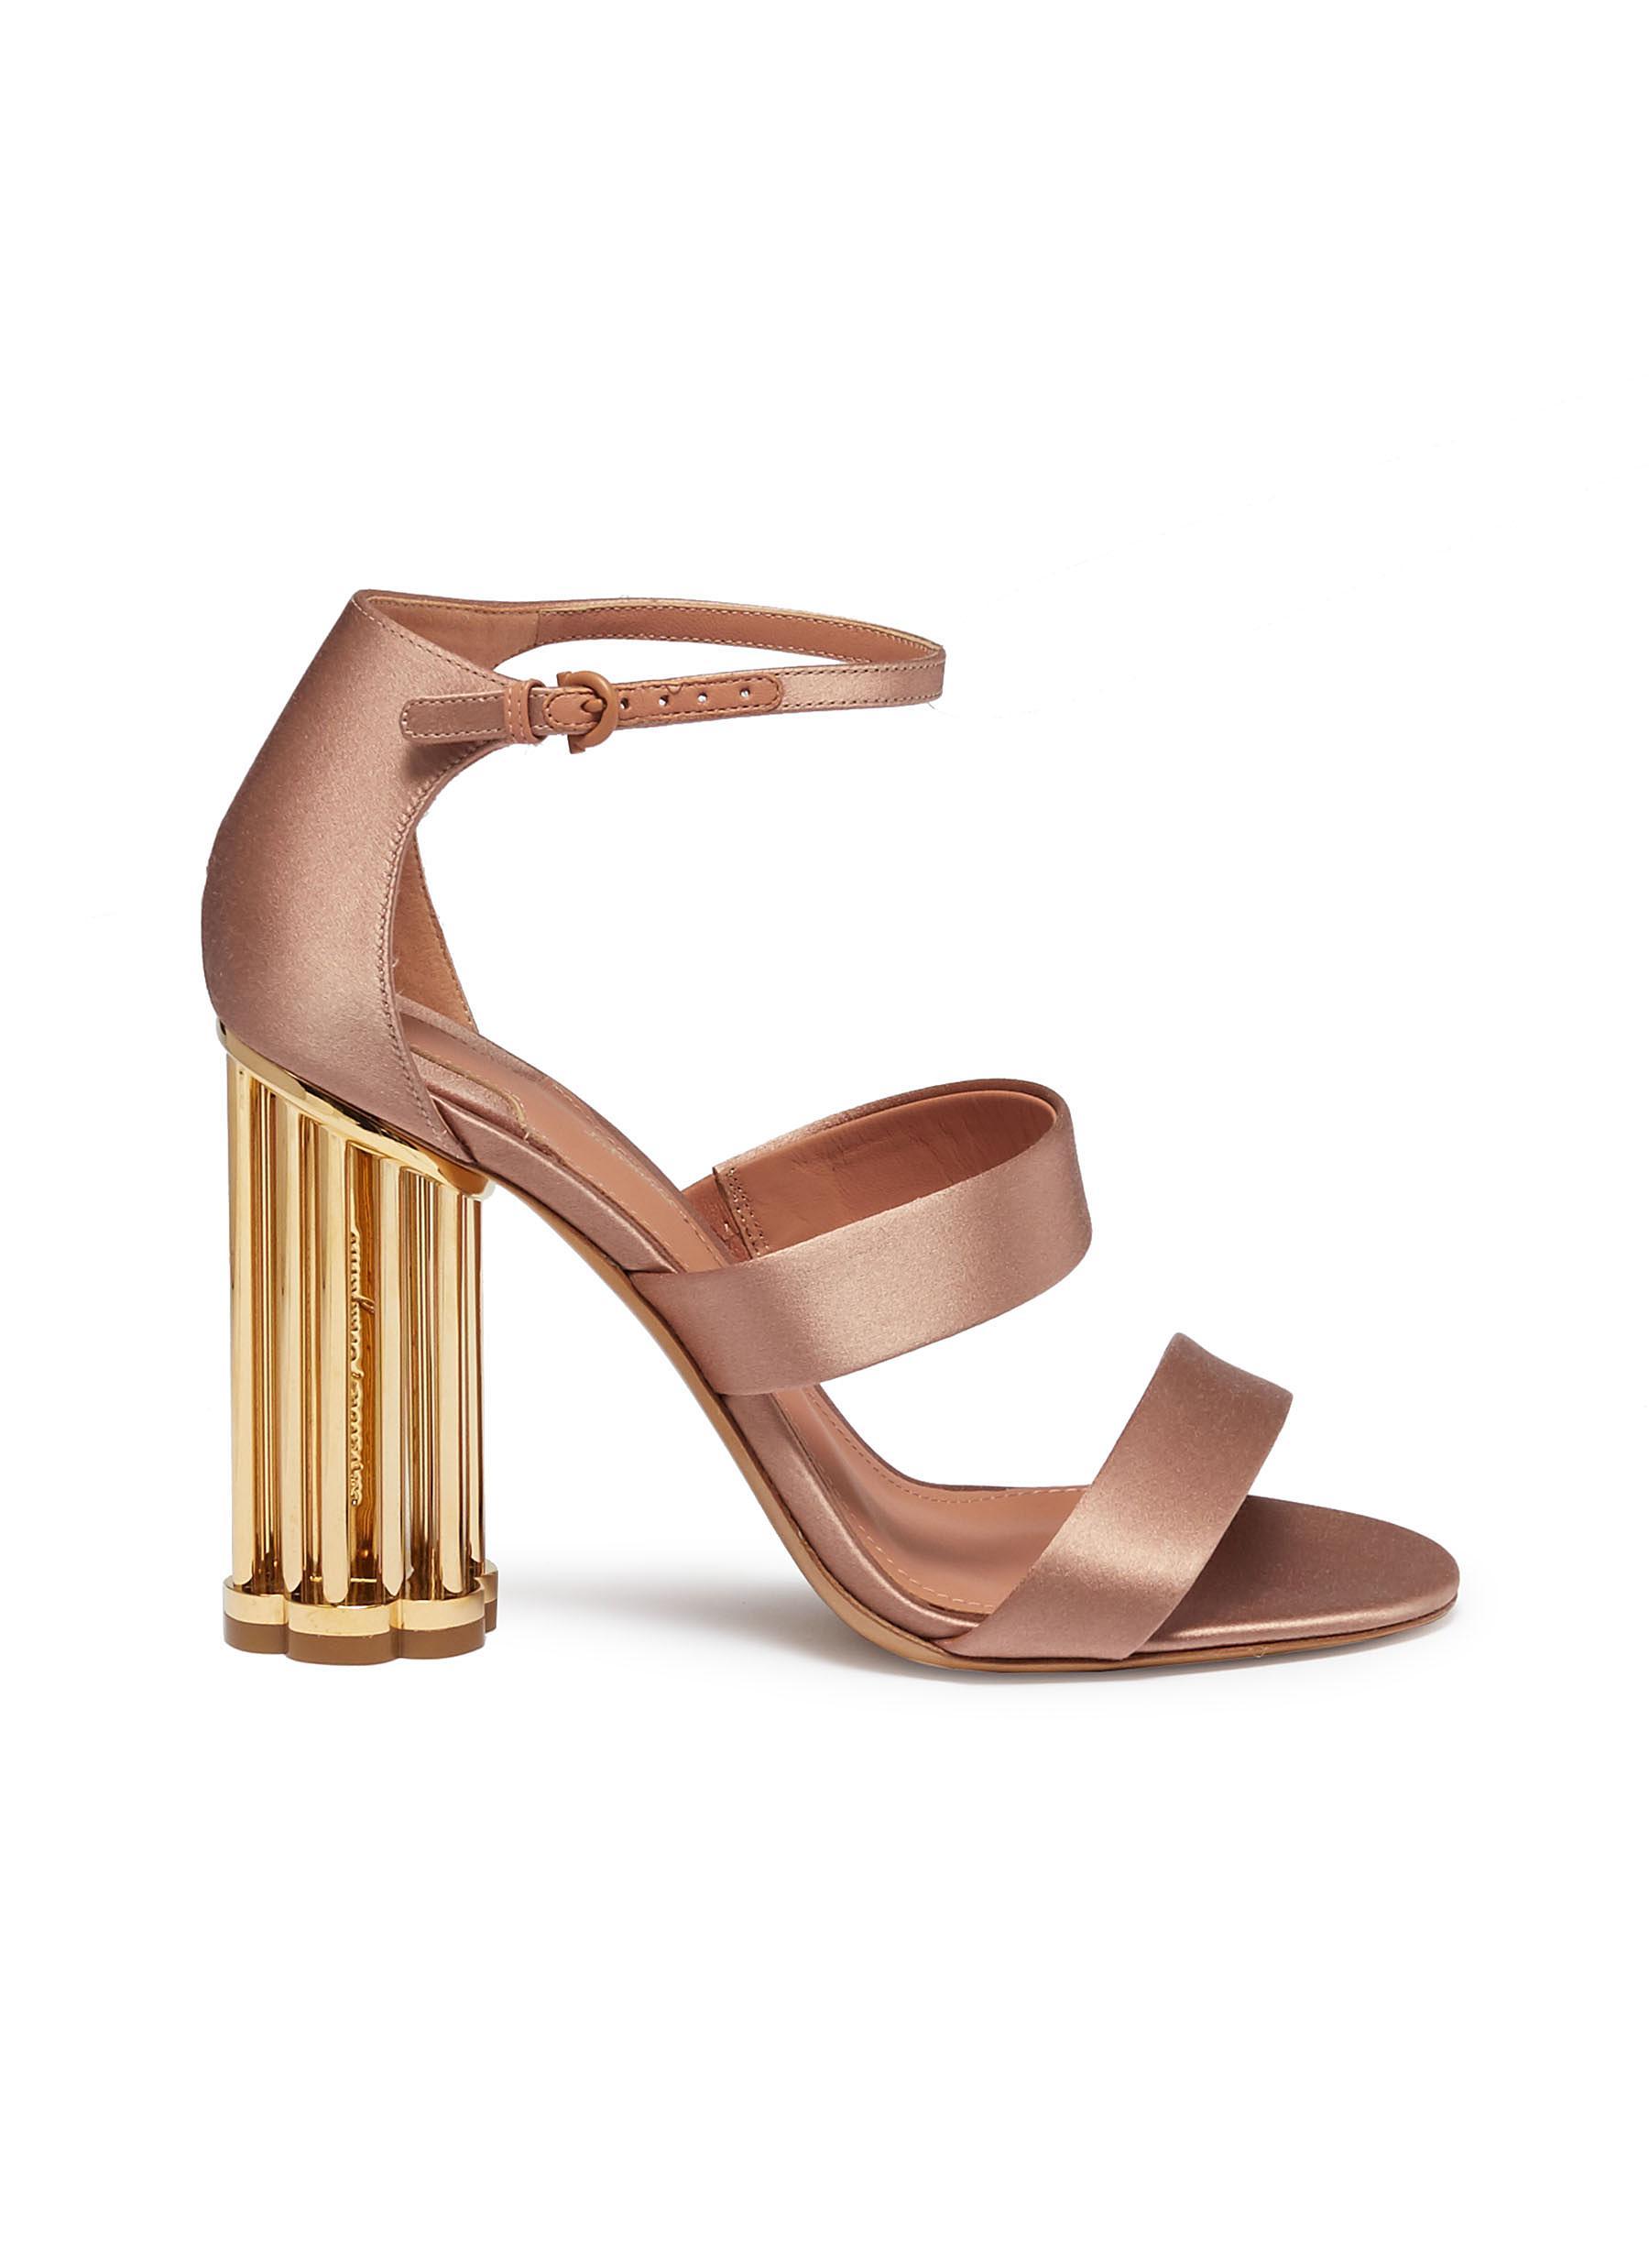 a5245917b2cc Salvatore Ferragamo.  Daiano  cage flower heel ankle strap satin sandals